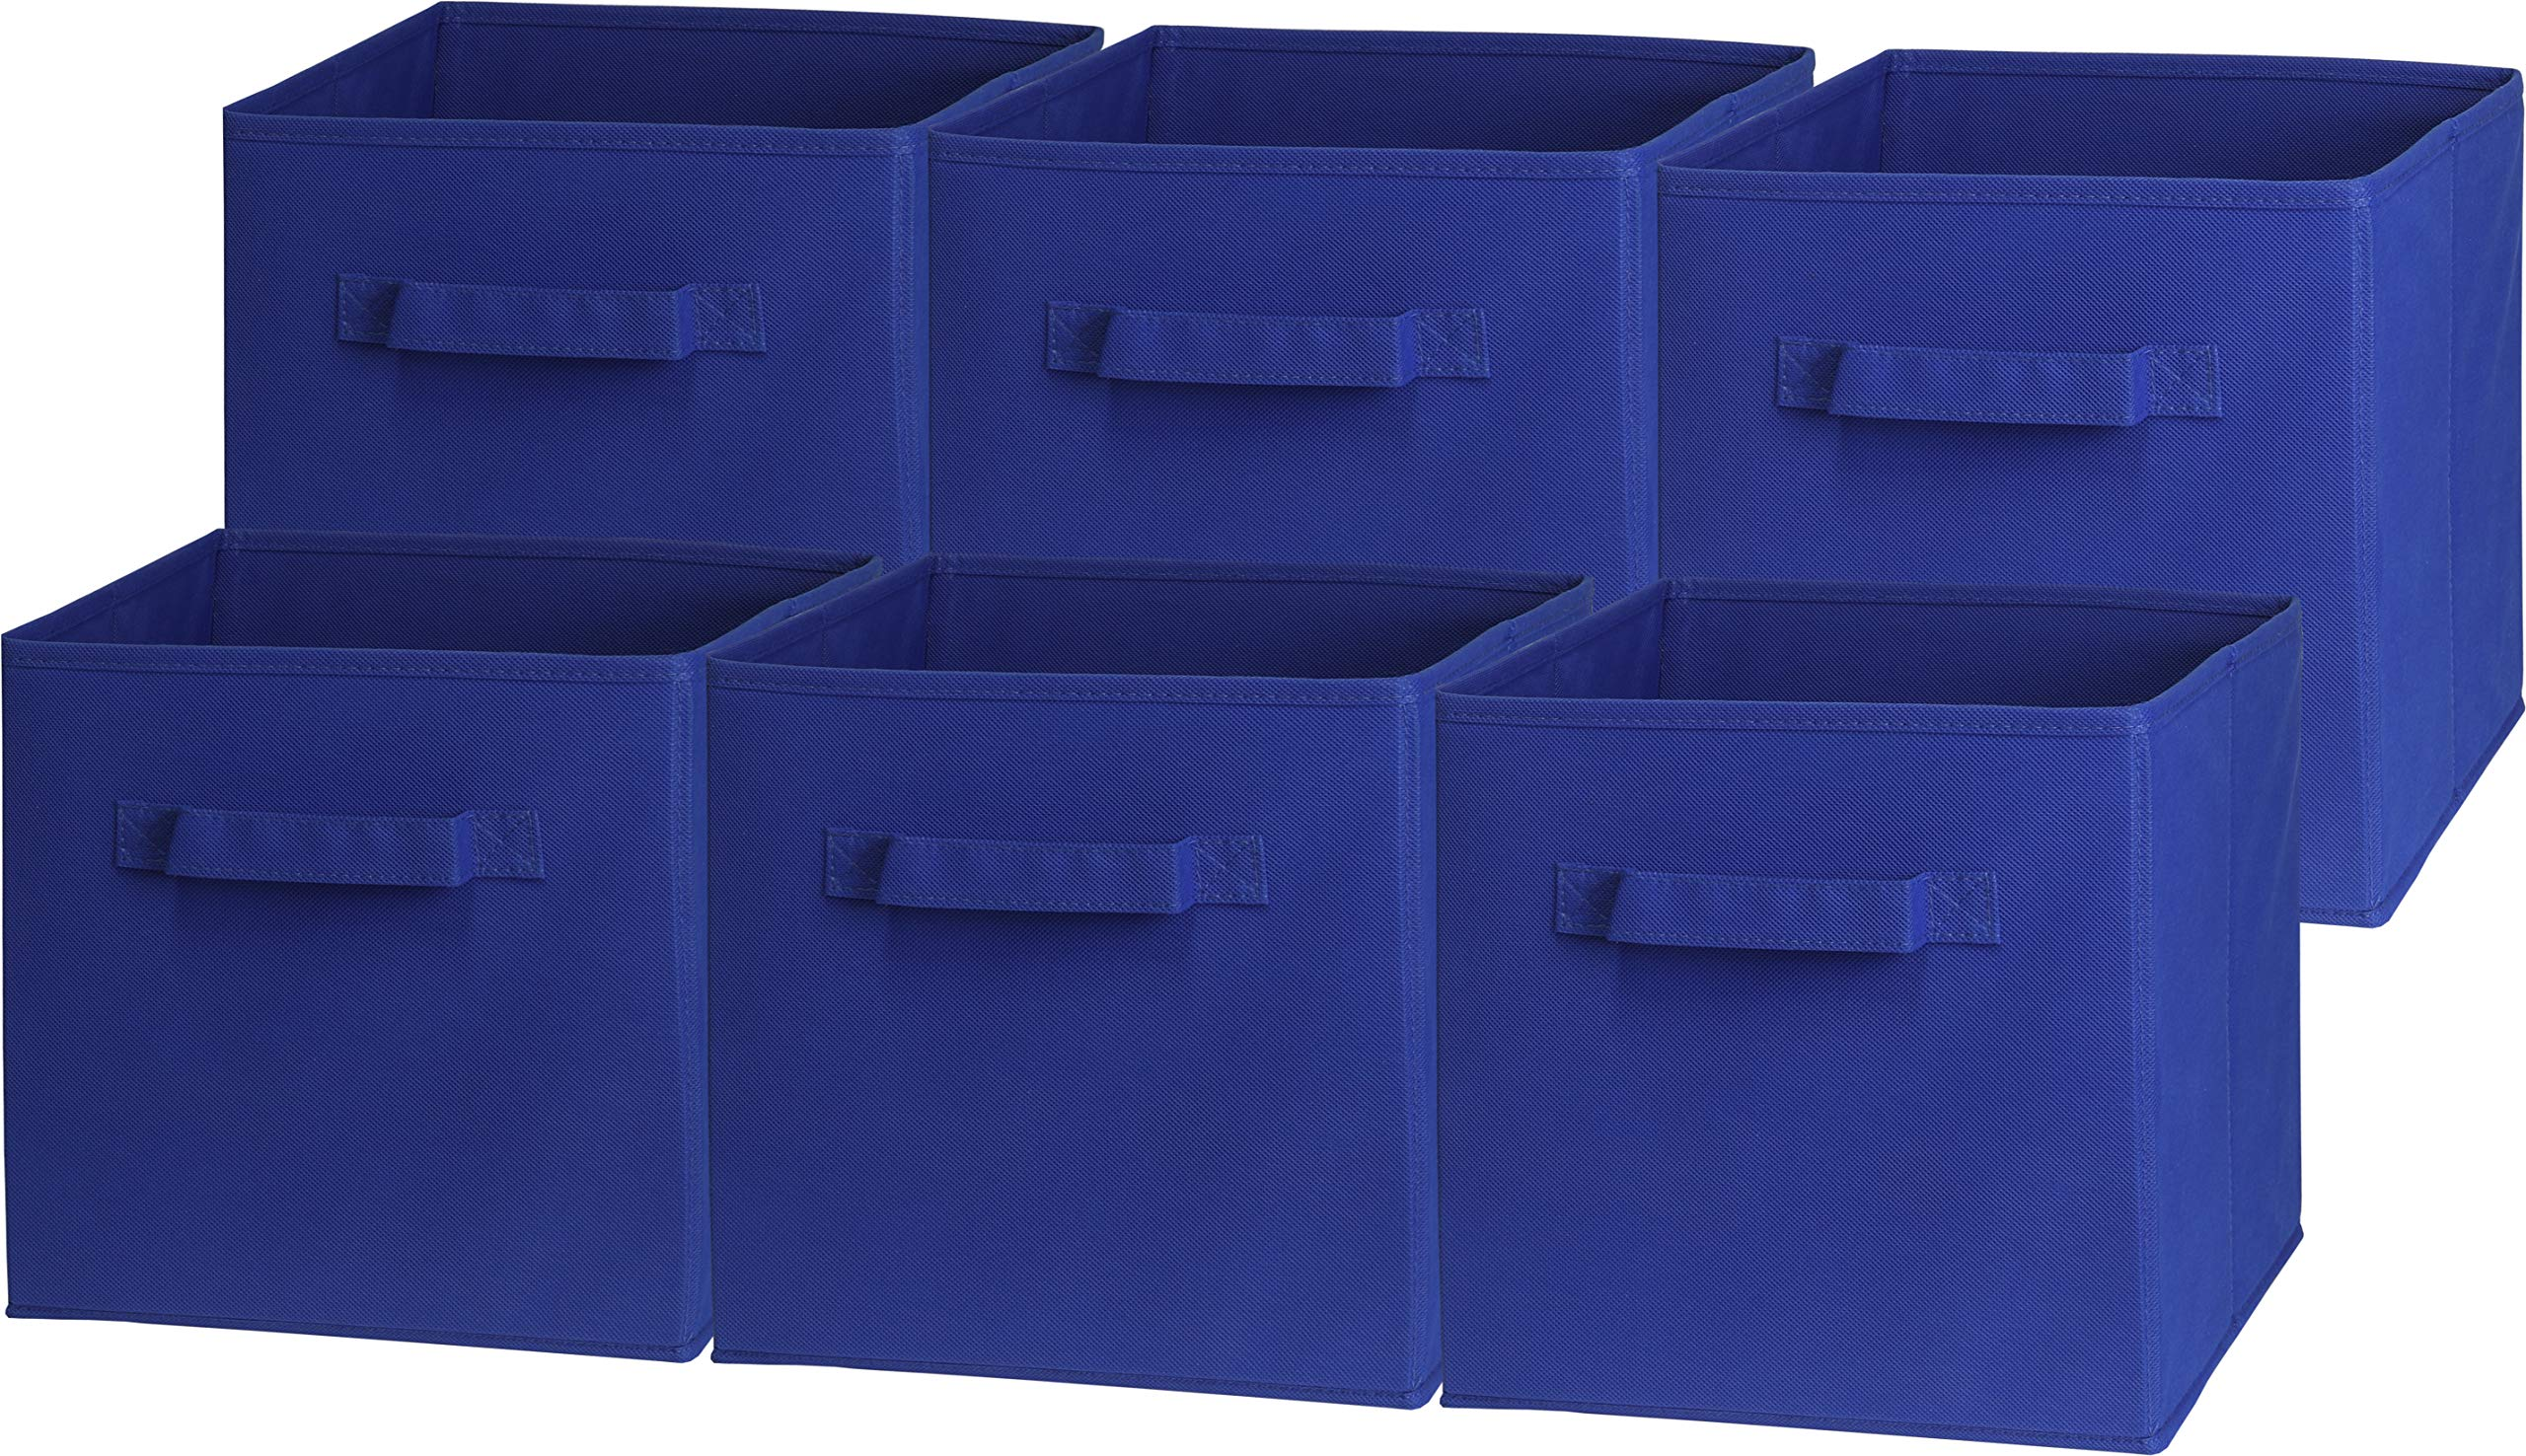 6 Pack - SimpleHouseware Foldable Cube Storage Bin, Dark Blue by Simple Houseware